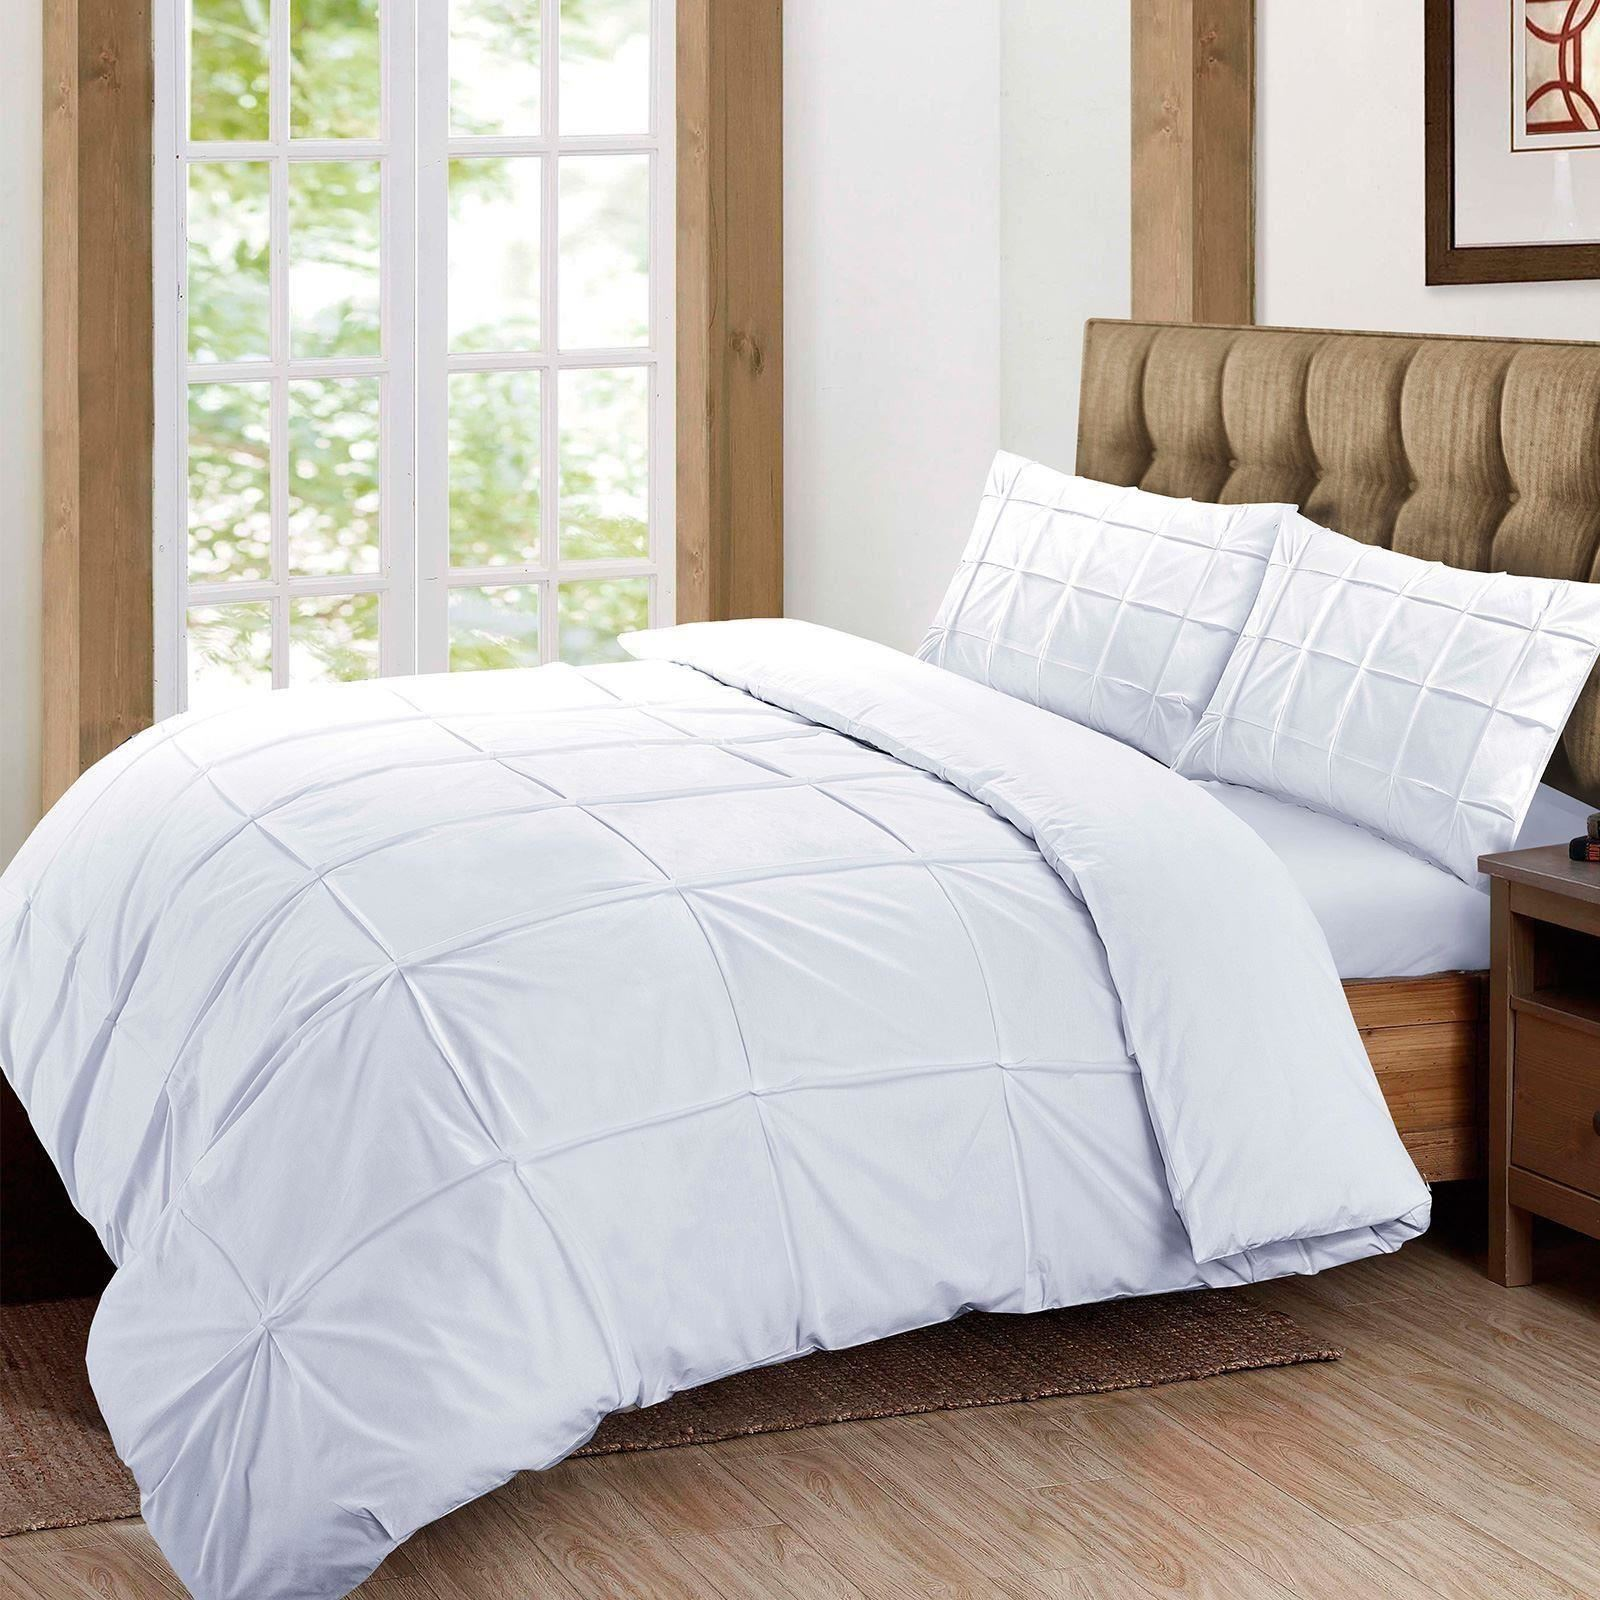 100-Algodon-Egipcio-Cubierta-Del-Edredon-Edredon-Juego-Individual-Doble-King-Size-Bed-Sabanas miniatura 15